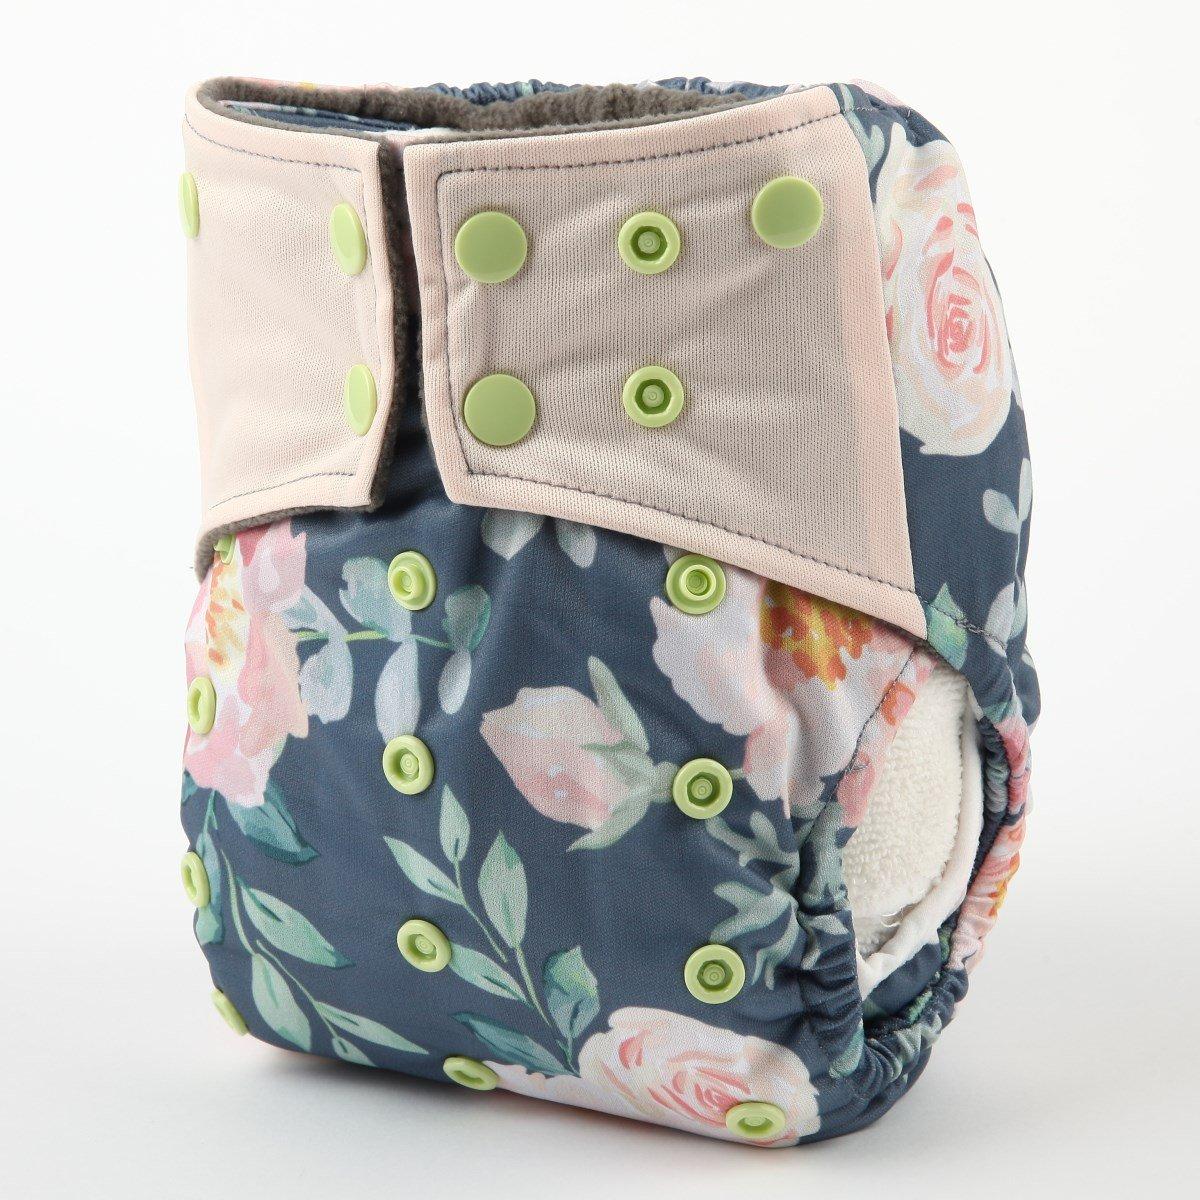 Baby Pocket Cloth Diaper Nappy Charcoal Bamboo Reusable Washable Owl Rabbit Hedgehog